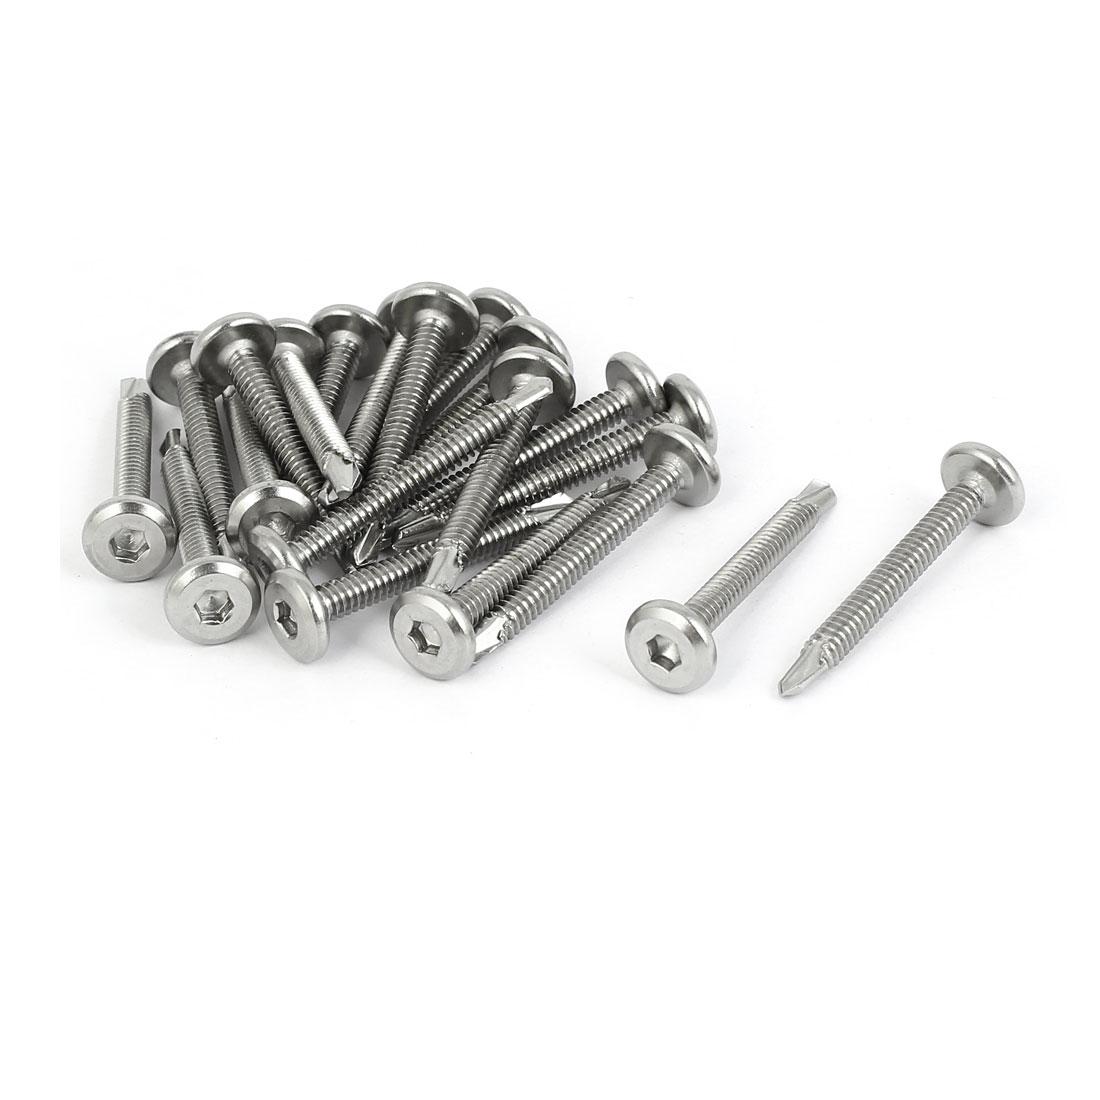 M5.5x42mm Thread Metal Hex Socket Cap Flat Head Self Drilling Tek Screws 20 Pcs